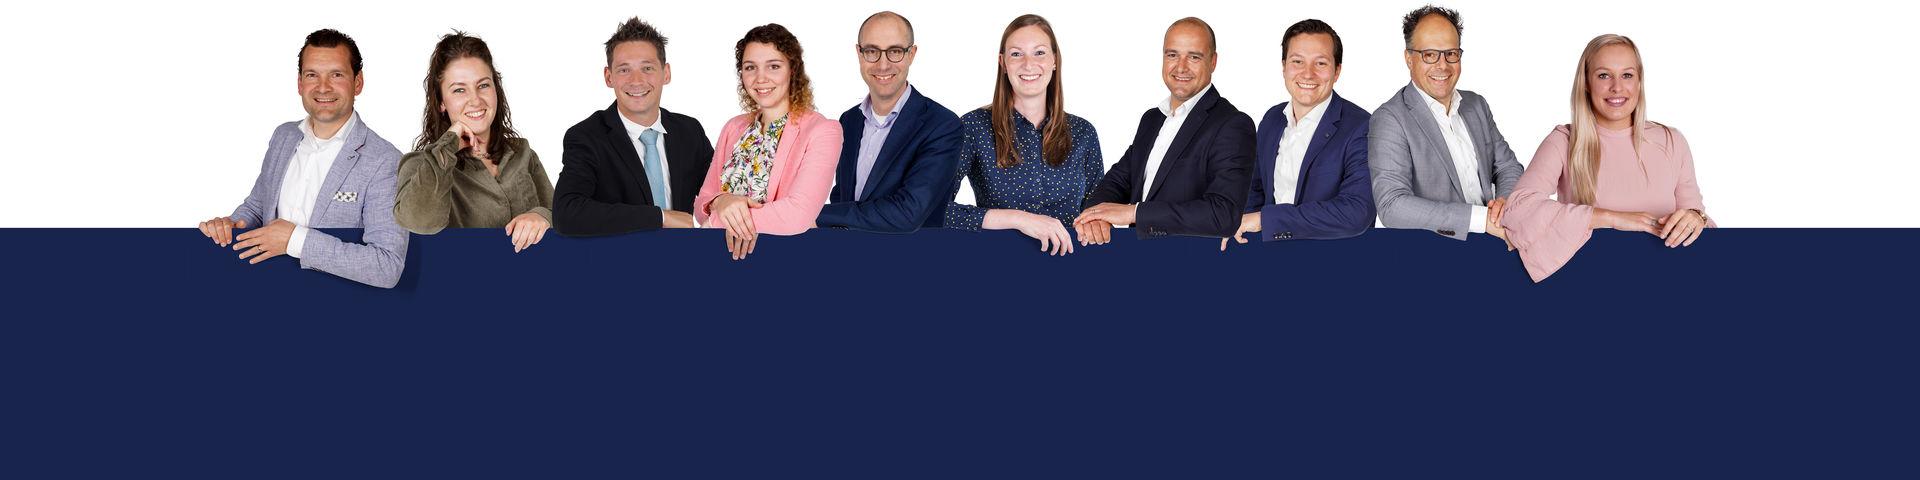 Team Vestiging Gilze & Rijen